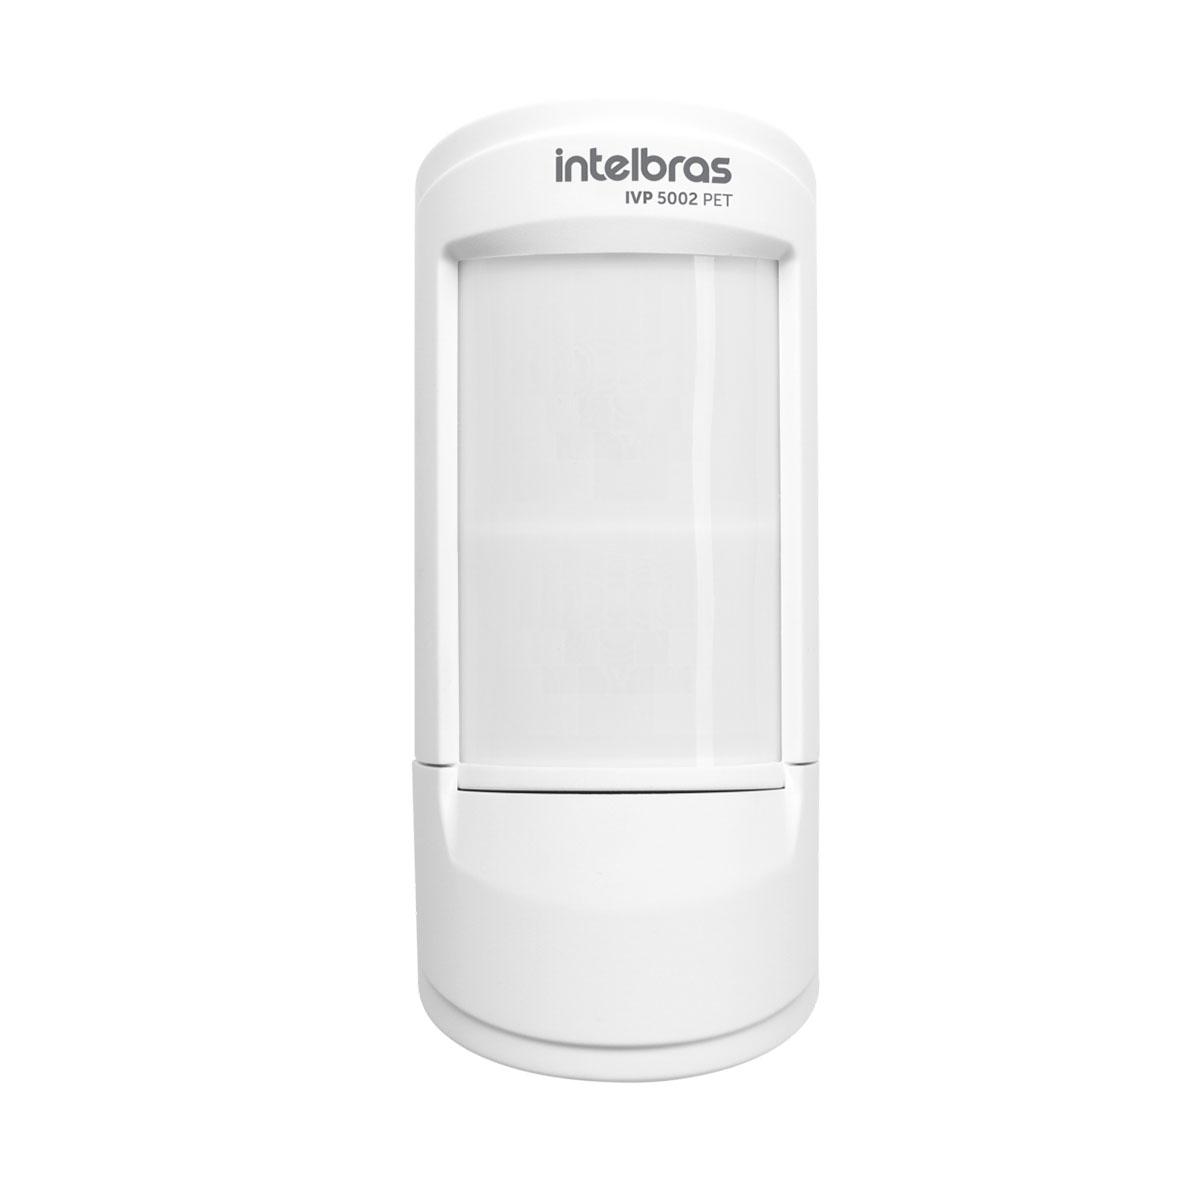 Kit 10 Sensor Semi Externo Com Fio Intelbras Ivp 5002 Pet